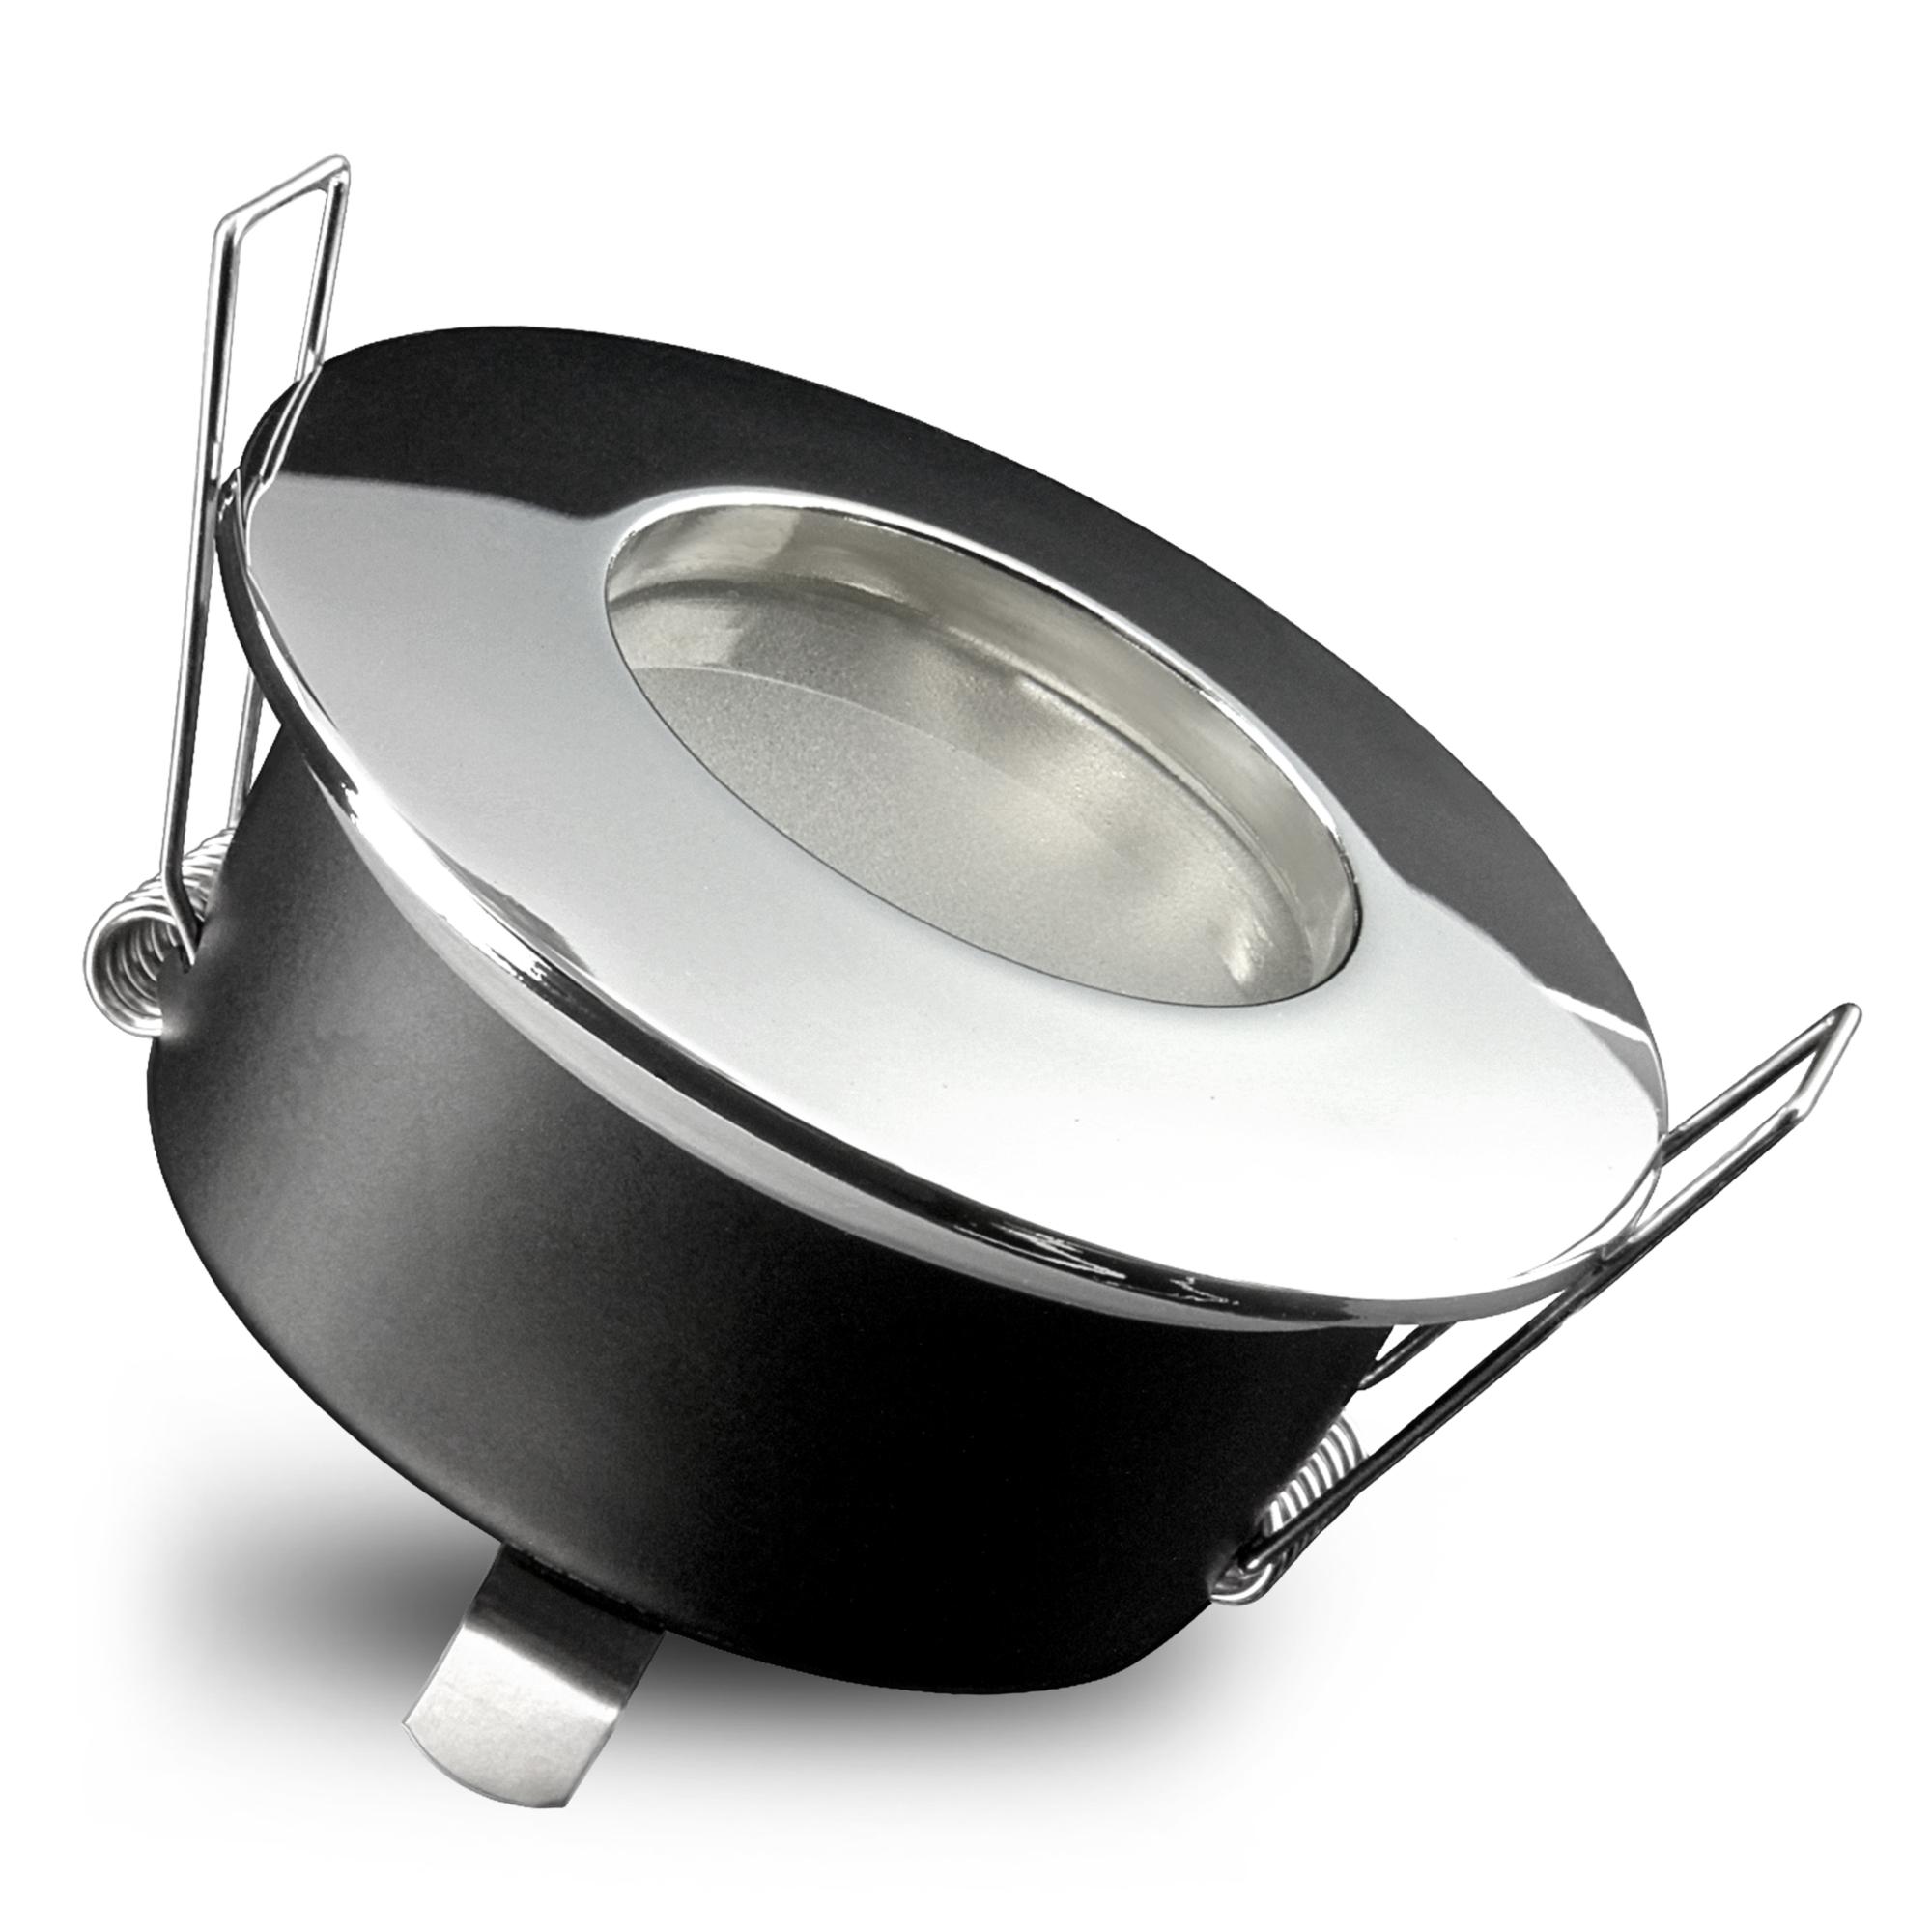 RW 20 LED Einbaustrahler Bad in Chrom glänzend IP20 Schutz inkl. LED GU200 20W  neutralweiß